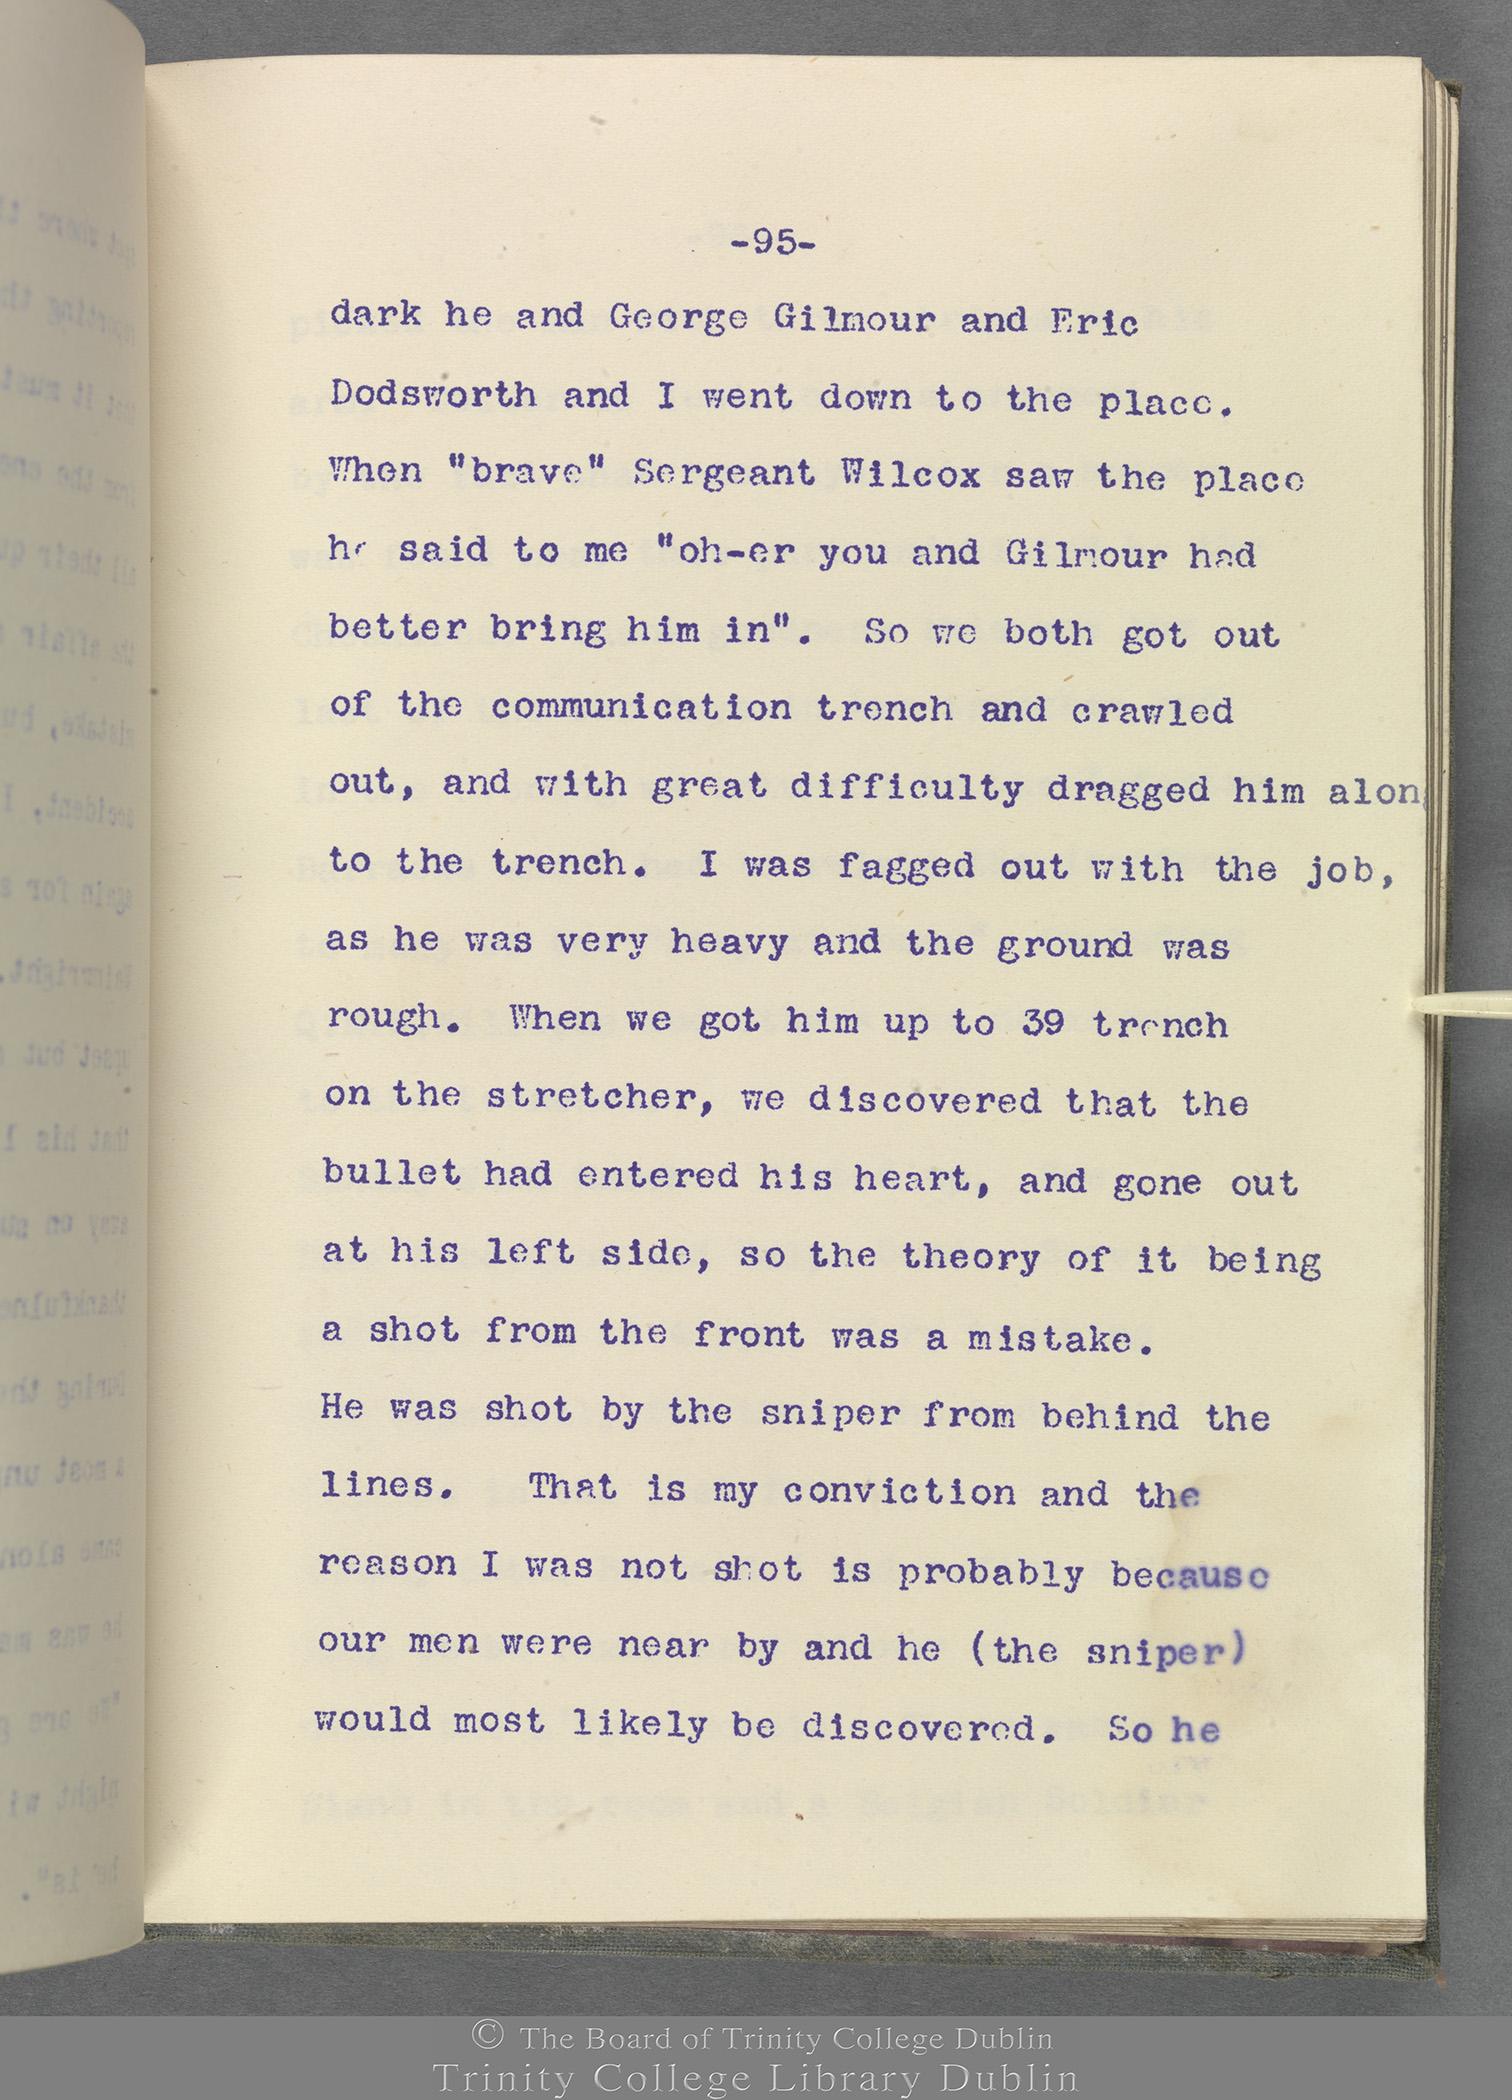 TCD MS 10853 folio 95 recto